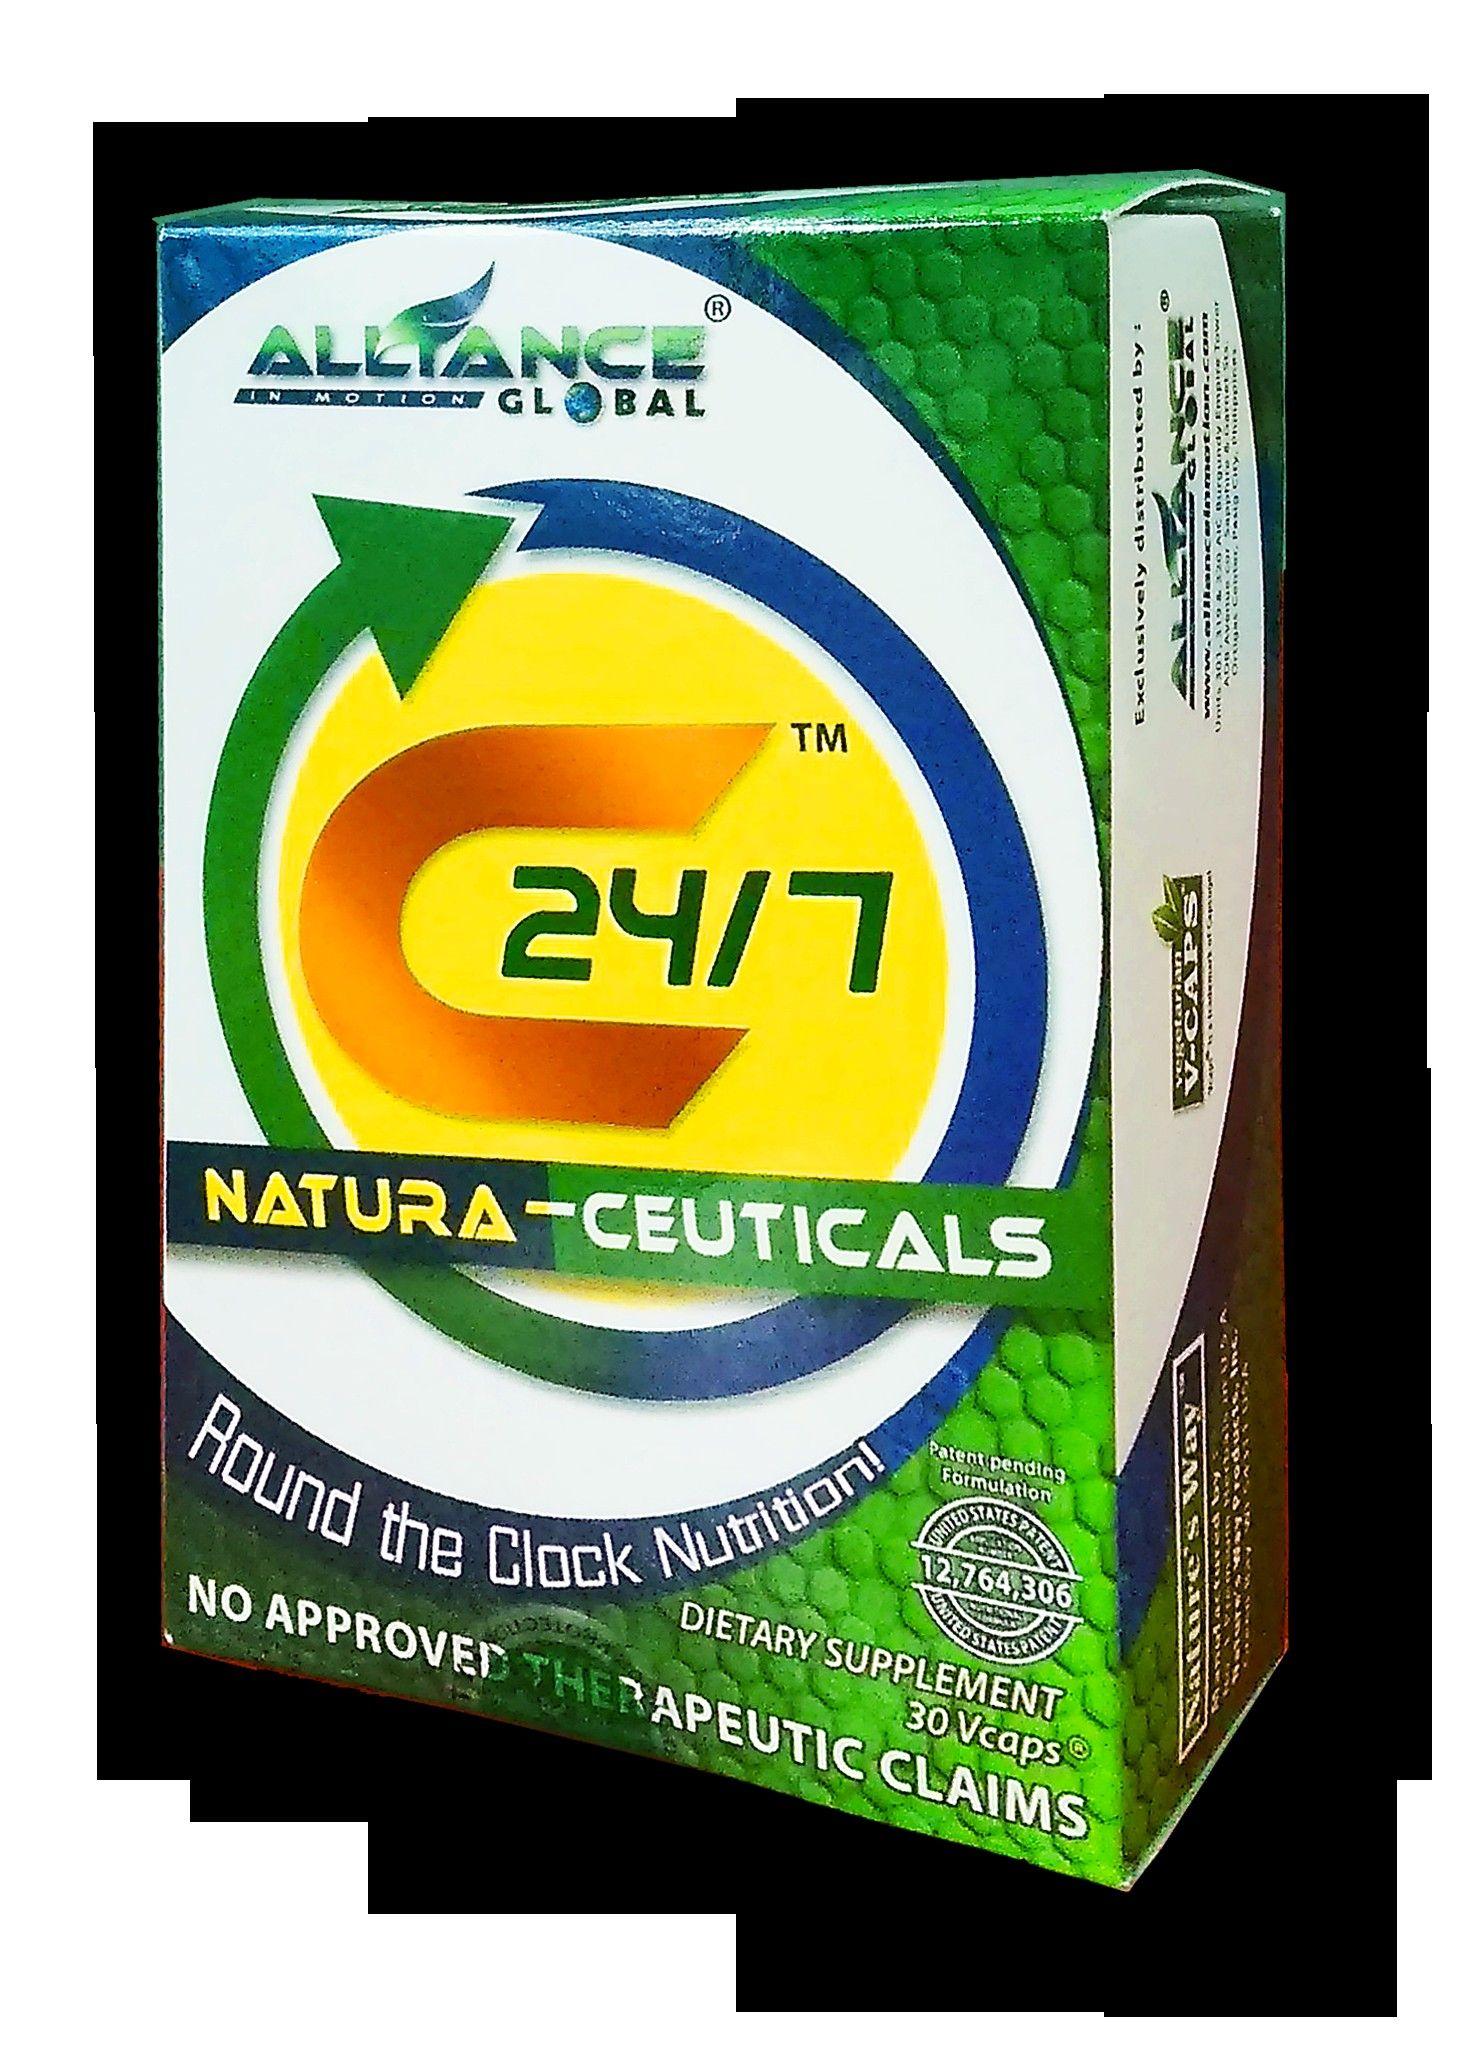 C247 naturaceuticals natural food supplements